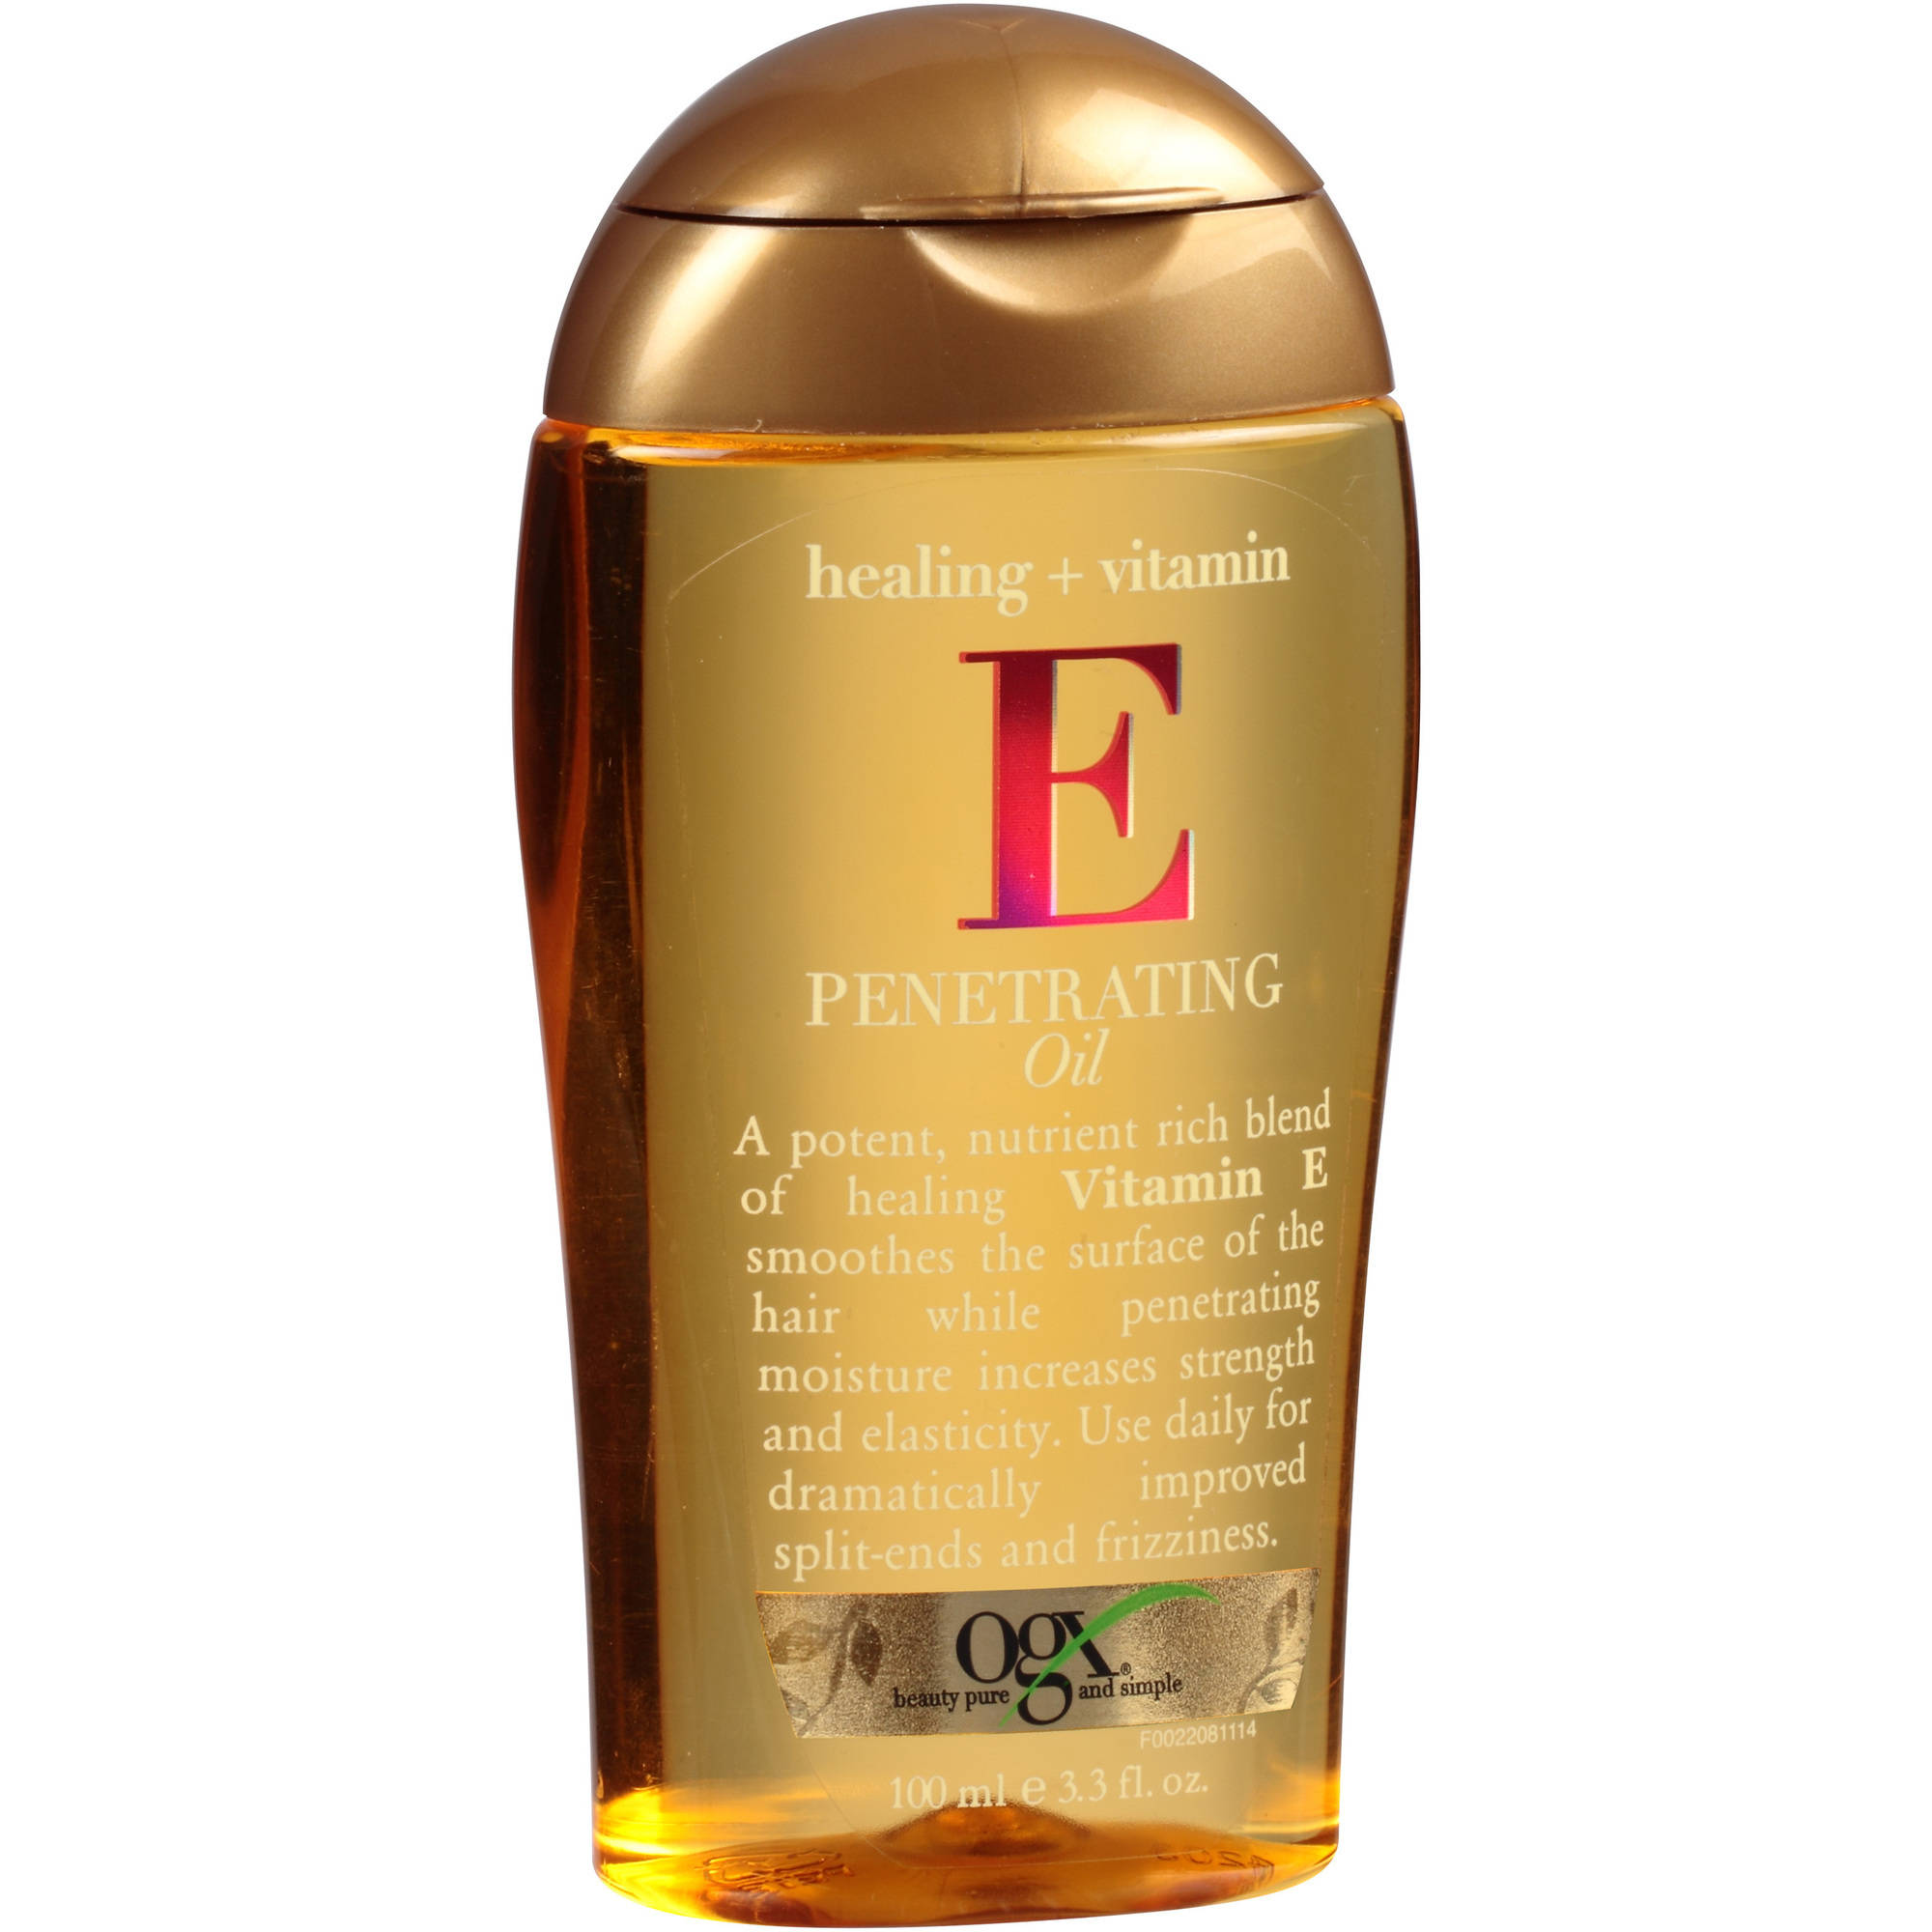 OGX Healing + Vitamin E Penetrating Hair Oil, 3.3 fl oz